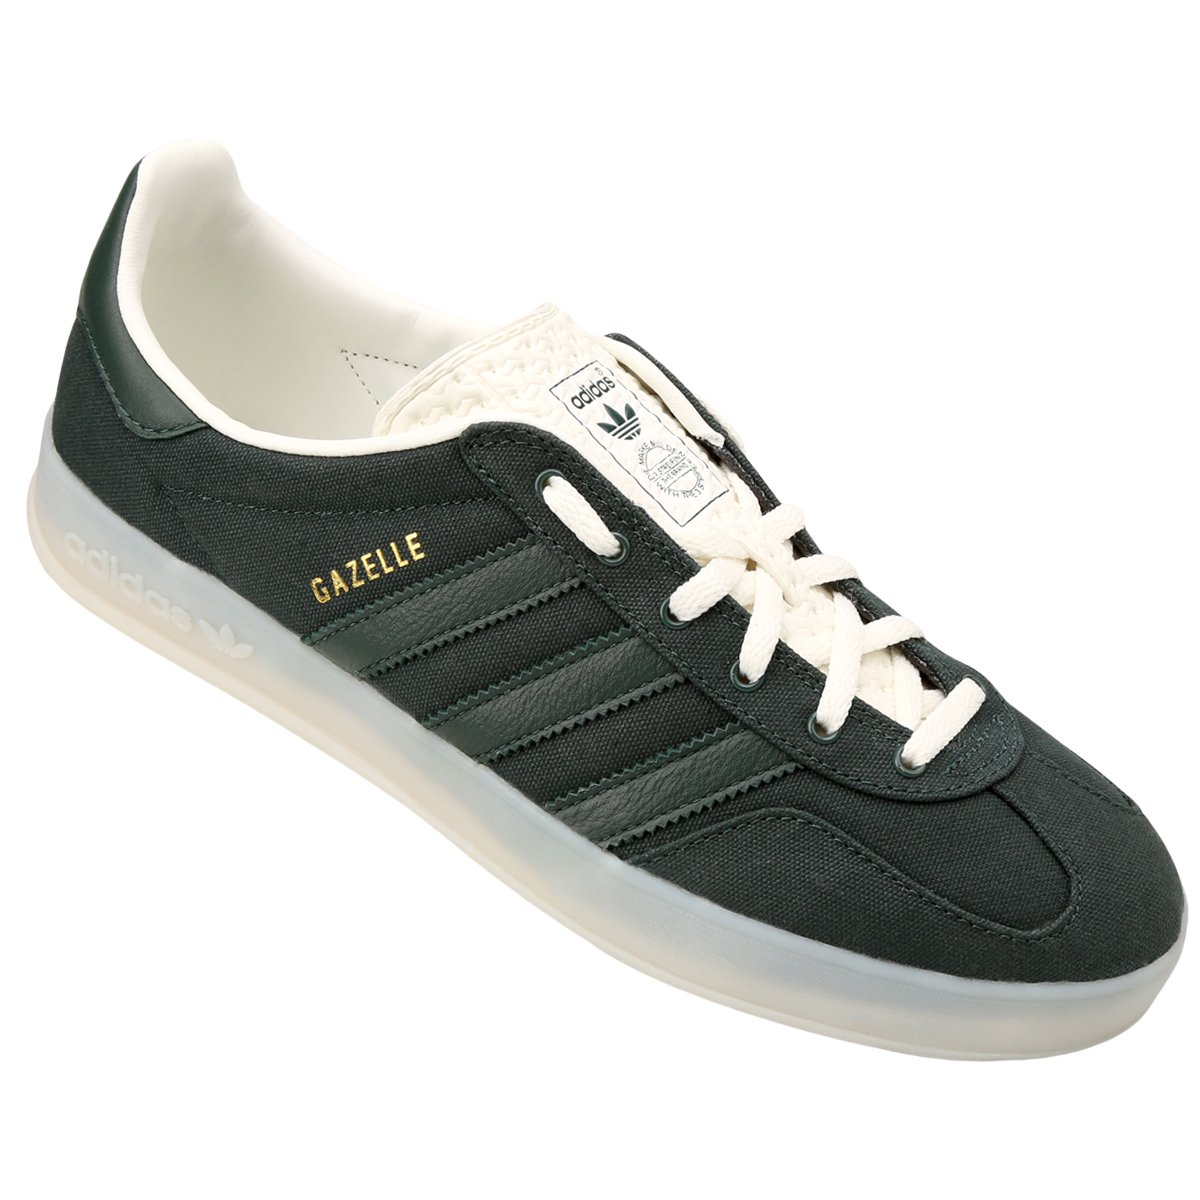 check out 4b934 c48b9 Tênis Adidas Gazelle Indoor - Compre Agora  Netshoes